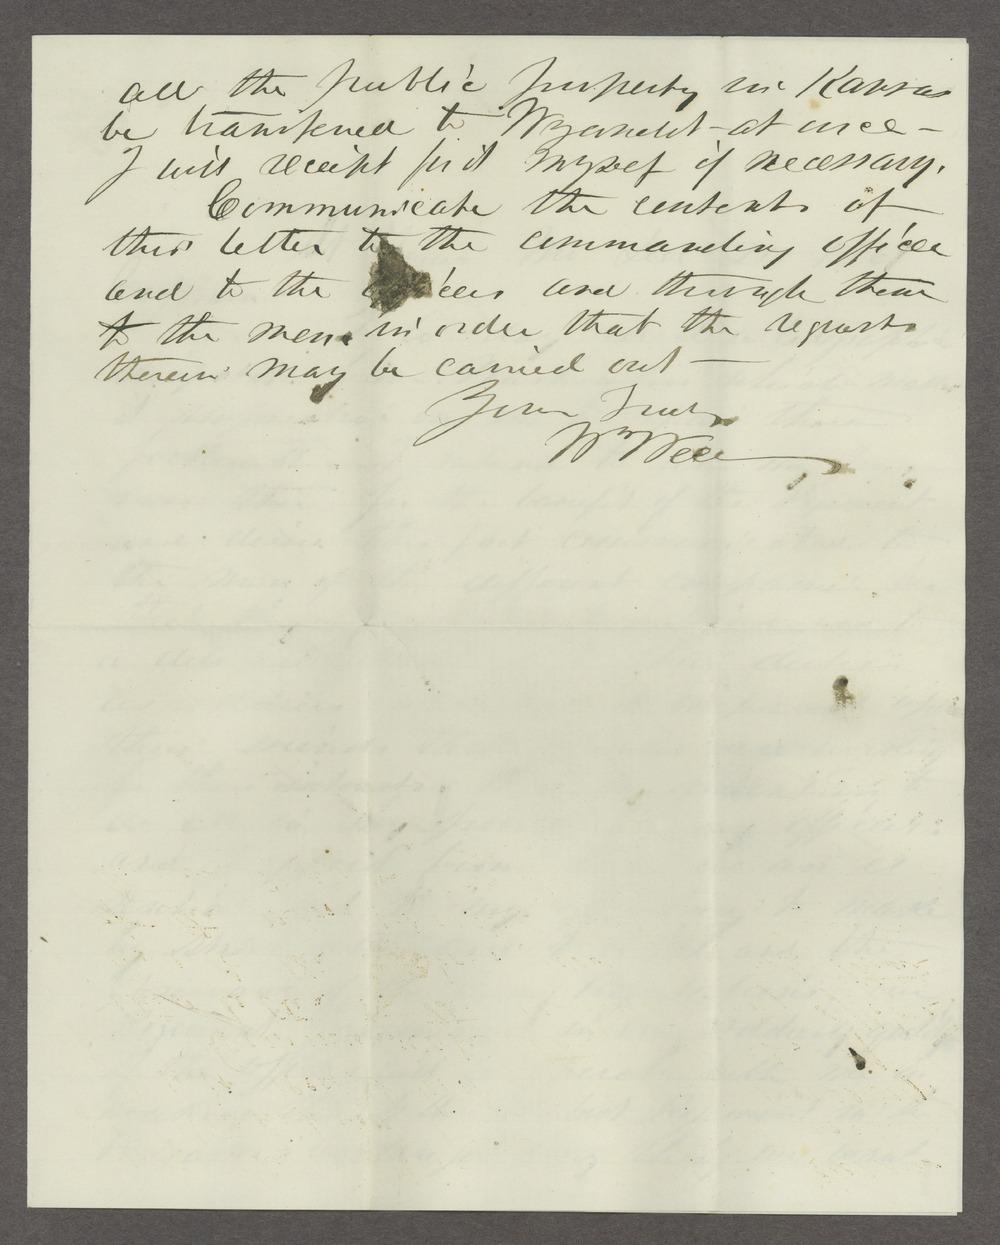 James Madison Harvey correspondence - 3